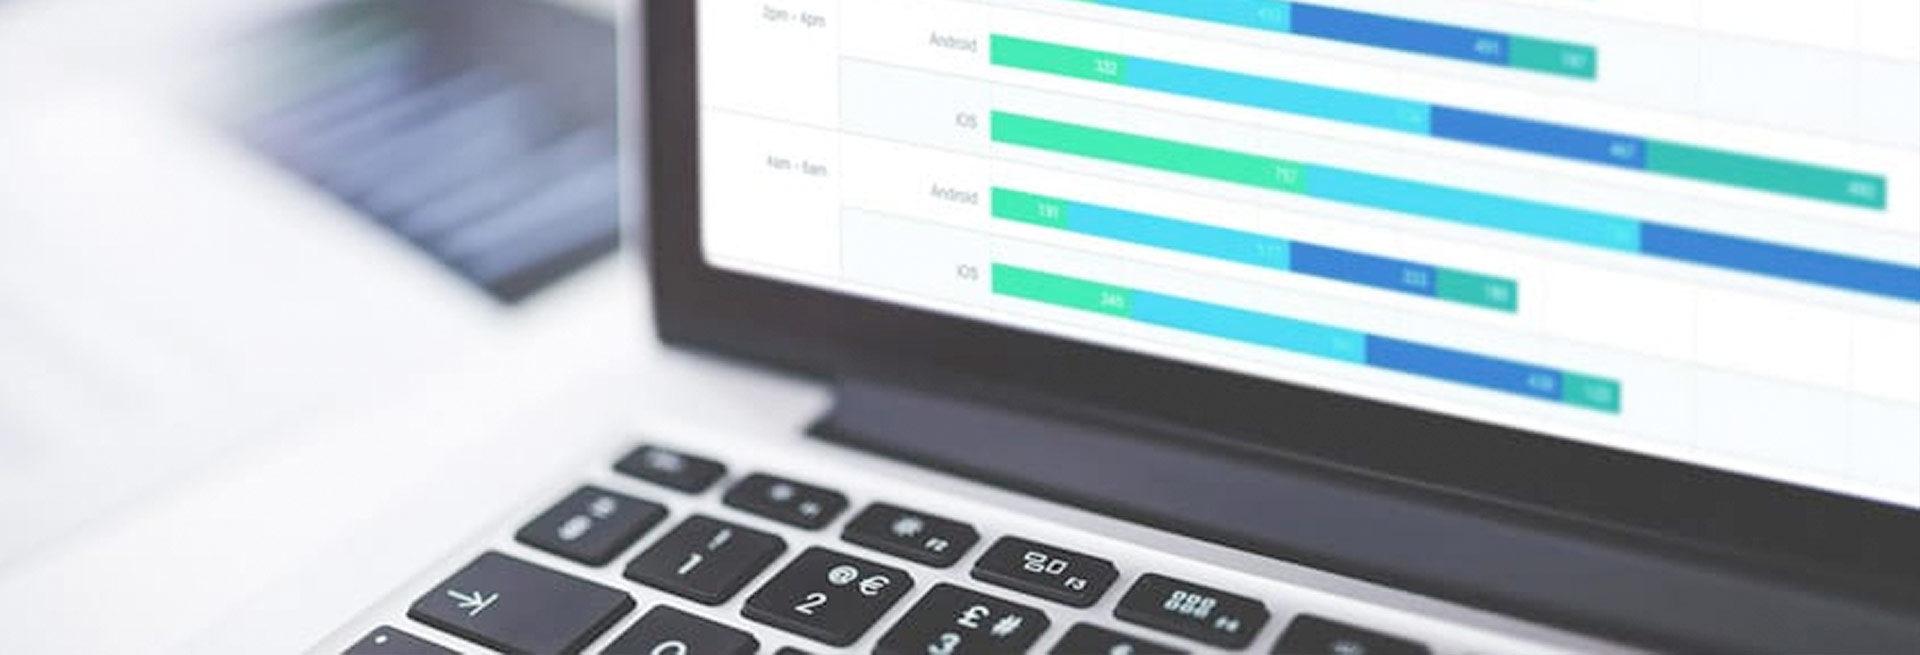 Mixpanel dashboard on laptop